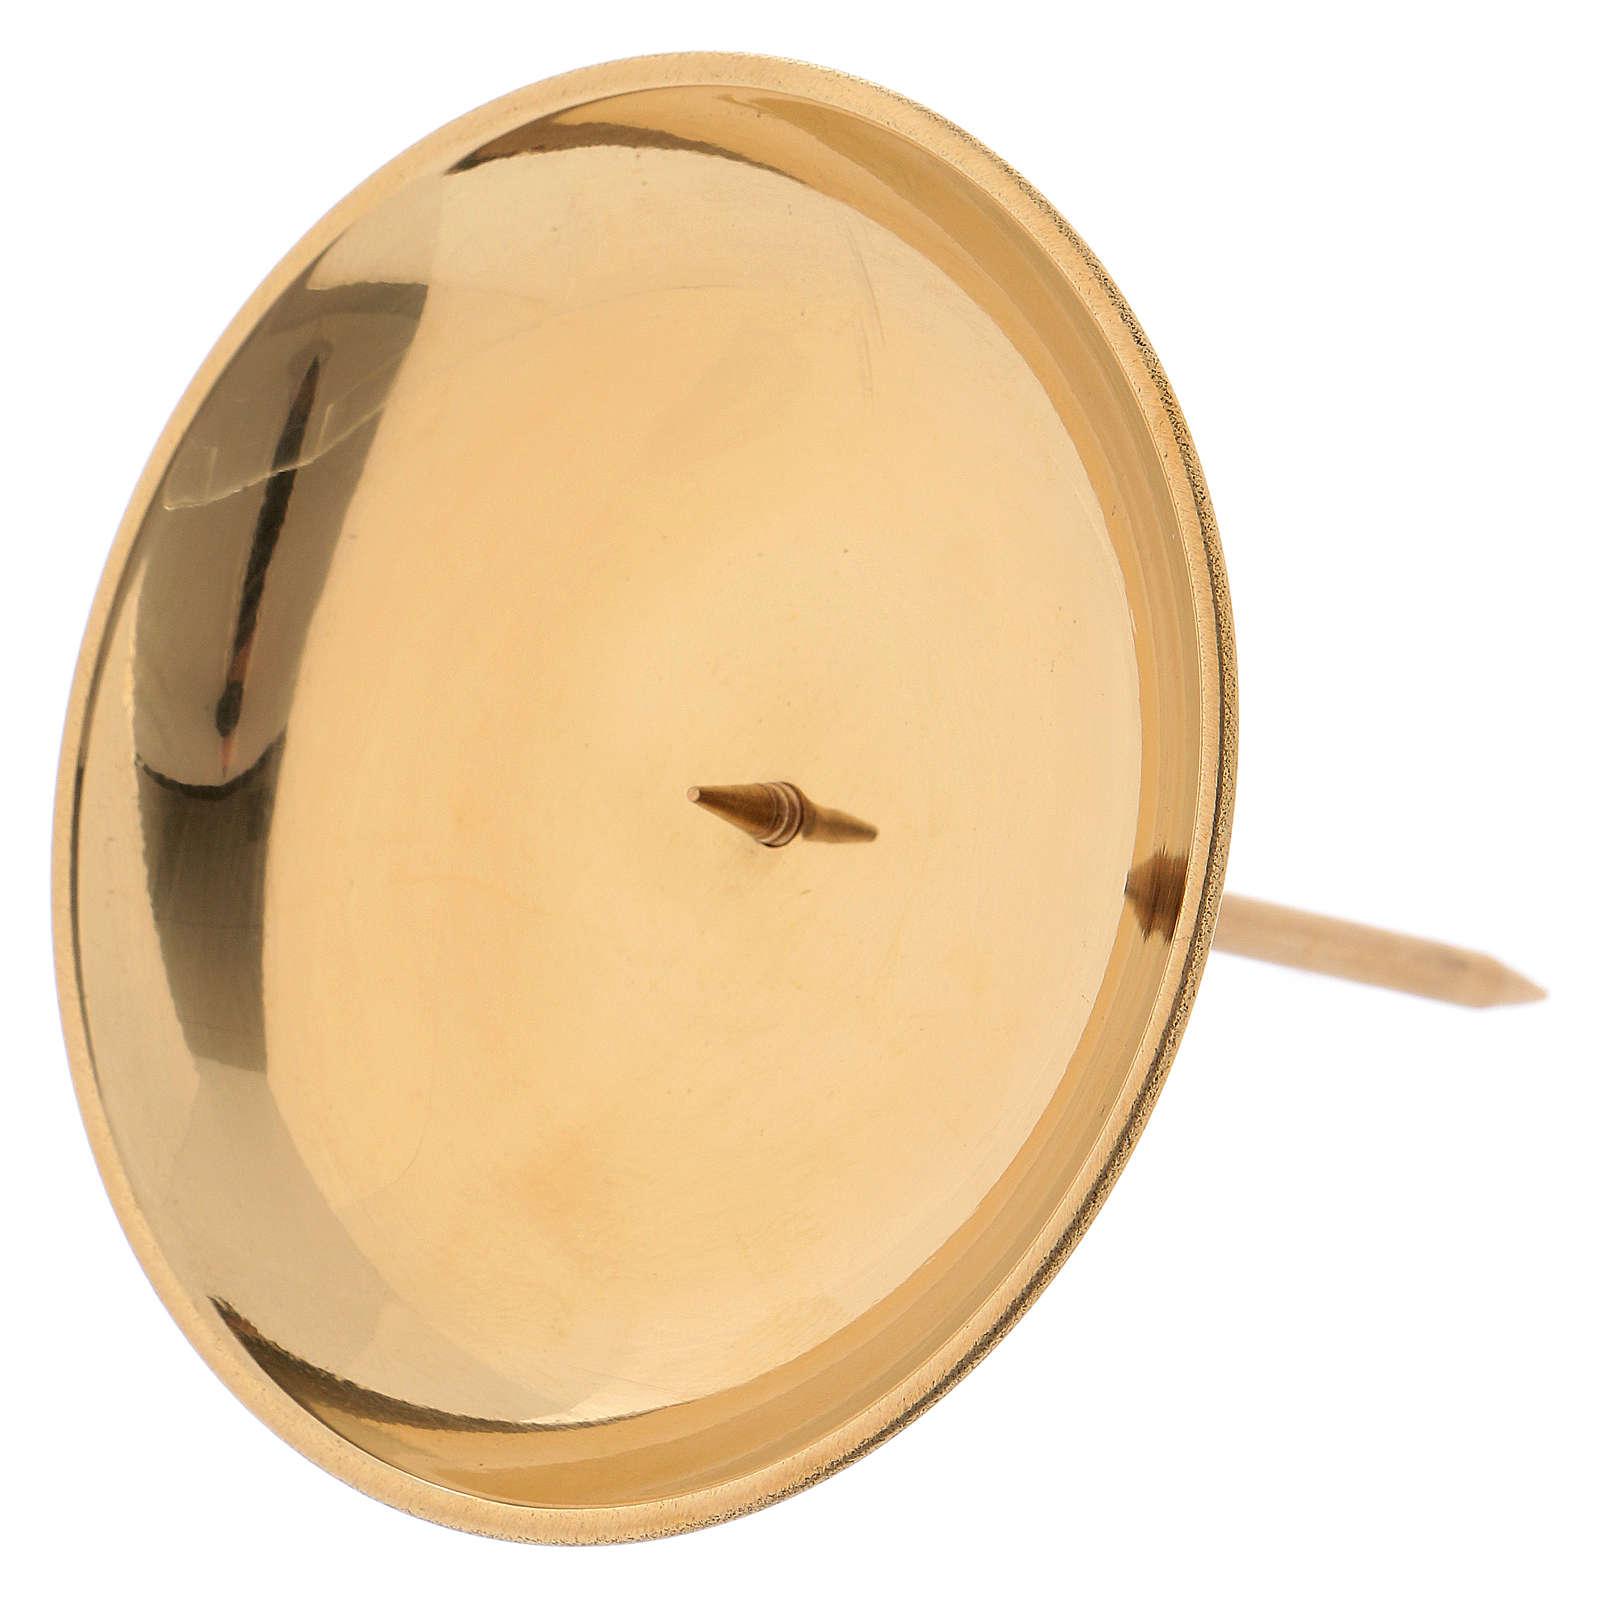 Portavela con punta para adviento 4 piezas latón dorado lúcido 3